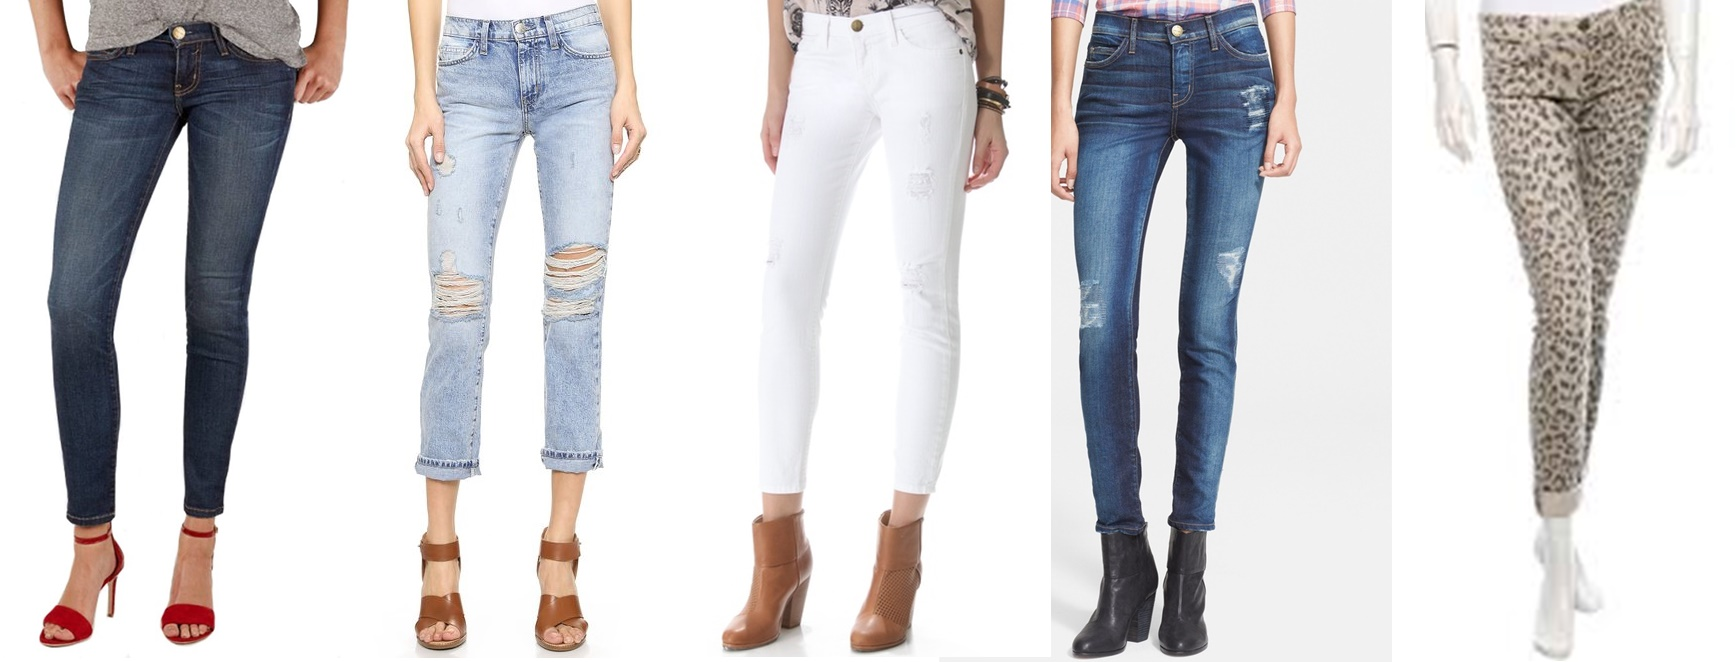 jeans04.jpg